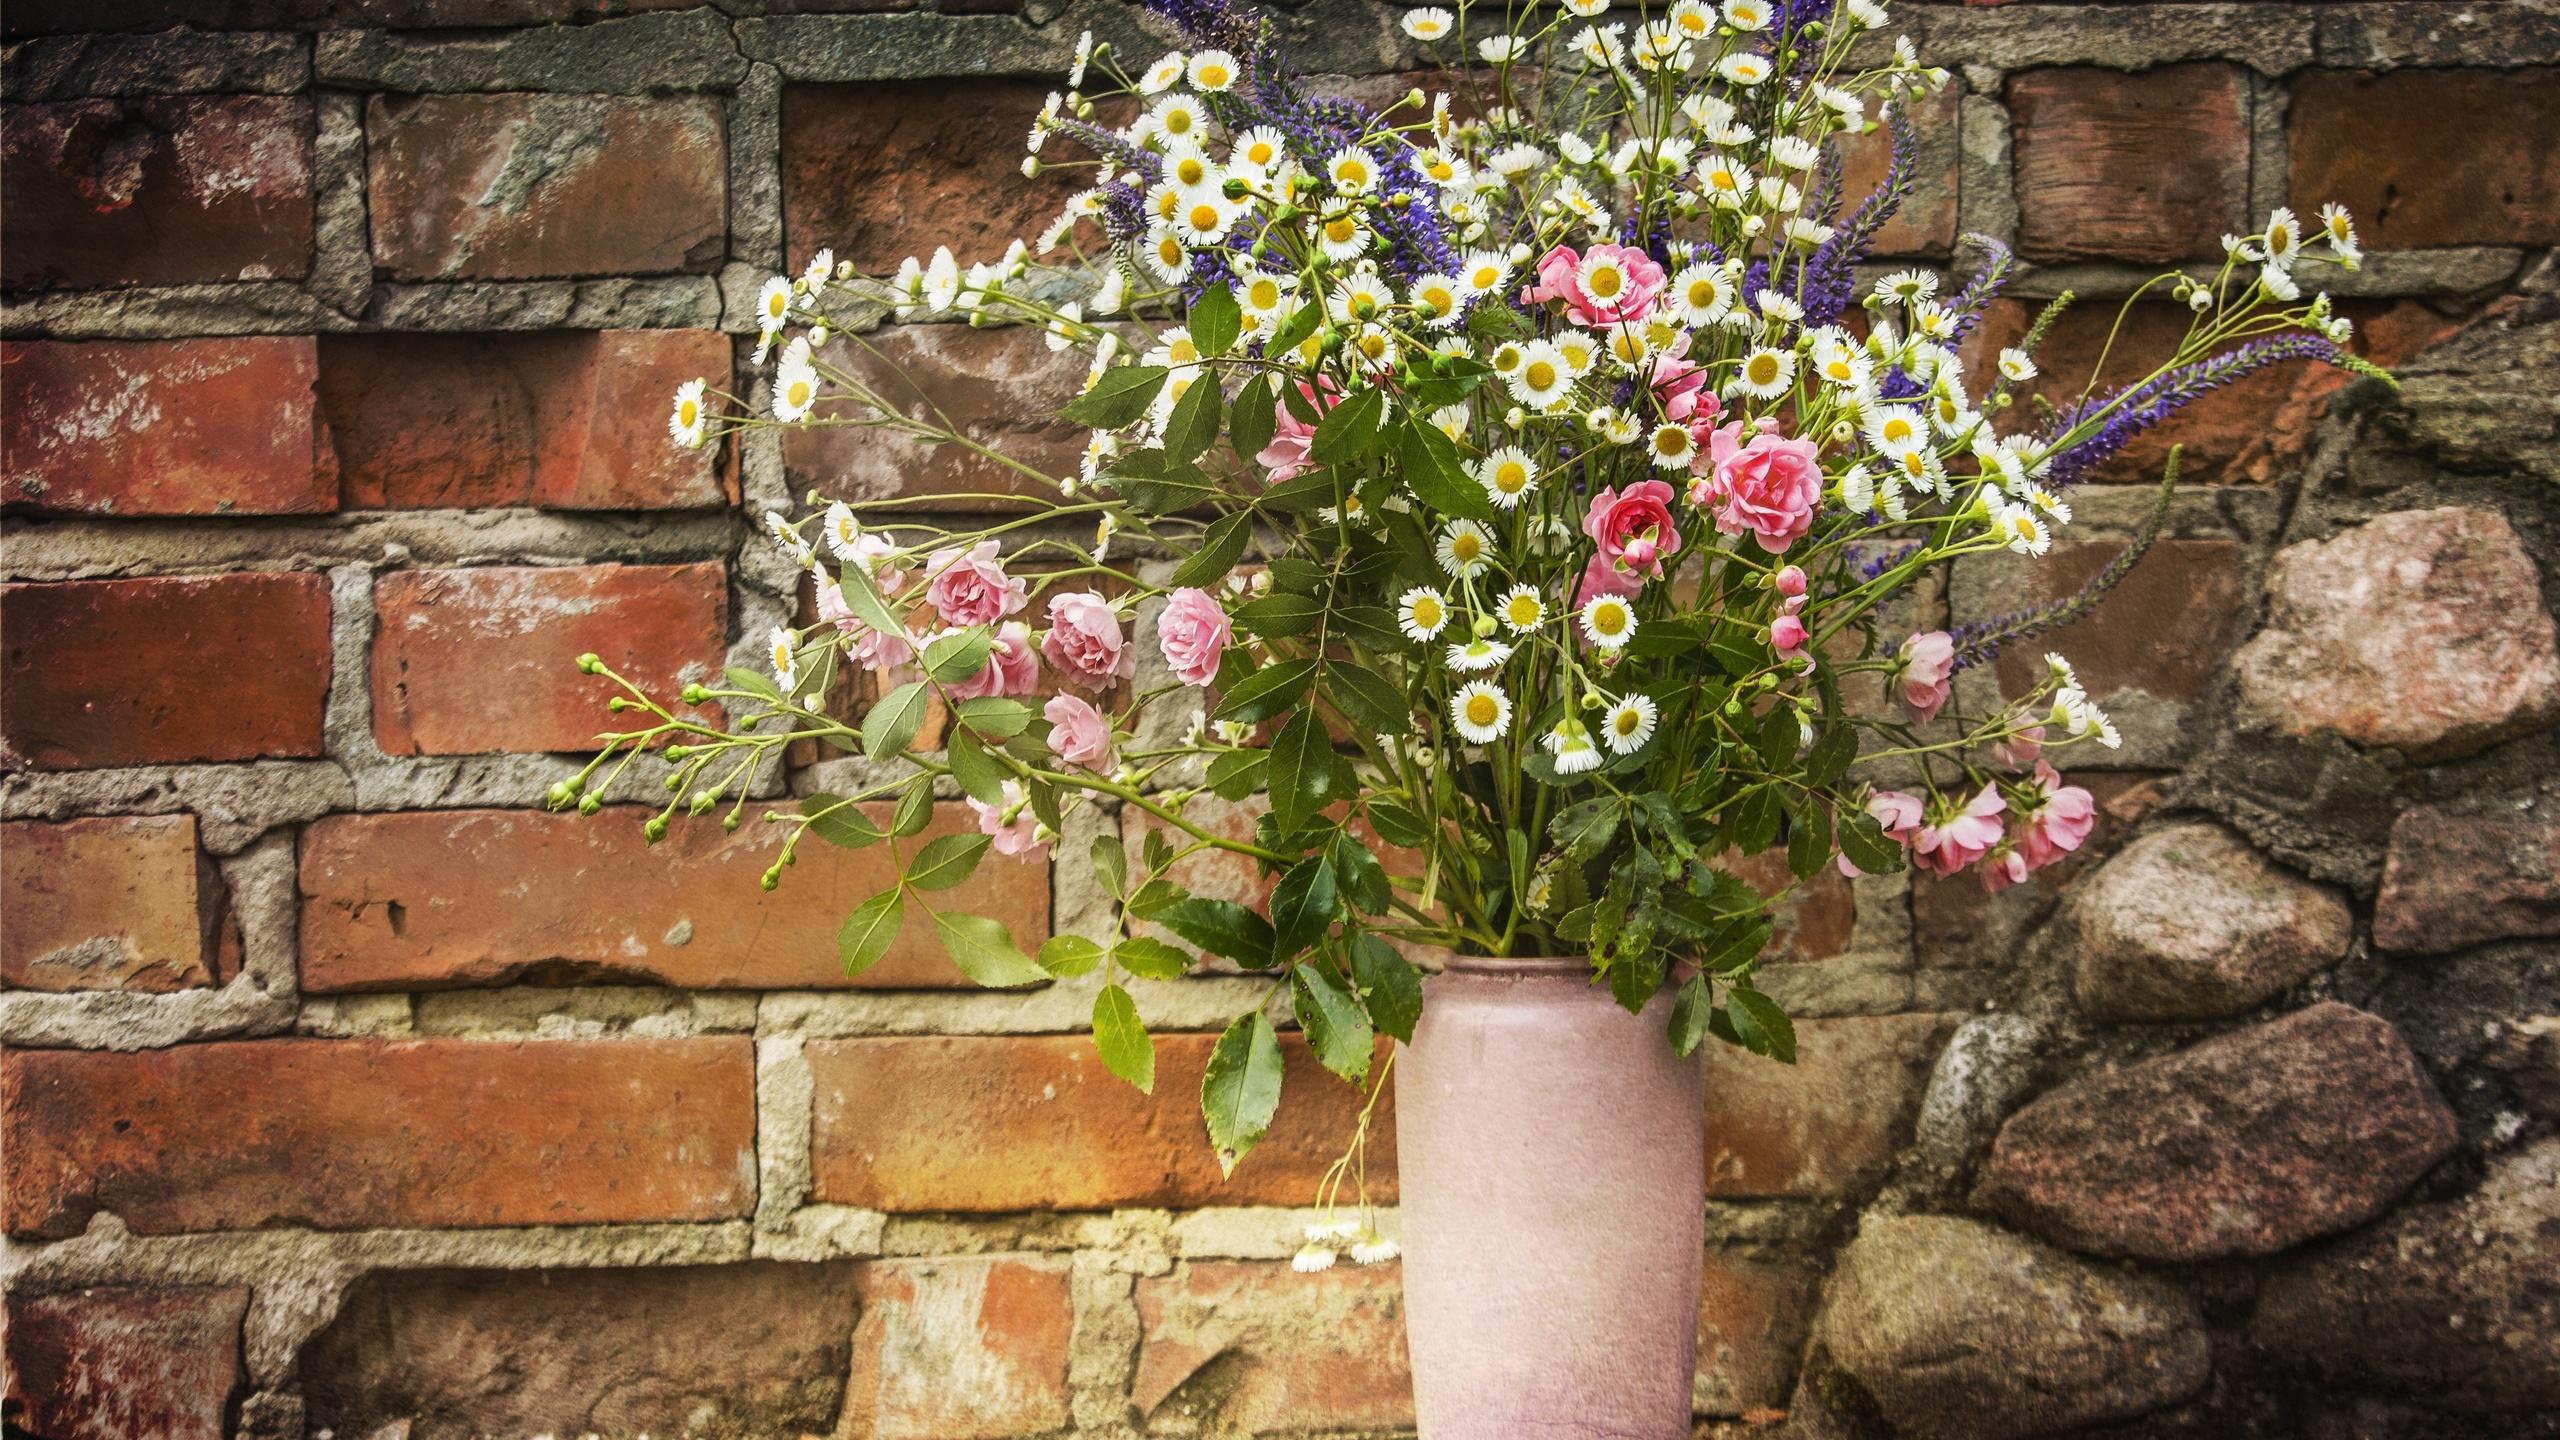 ваза, букет, цветы, стена, кирпич